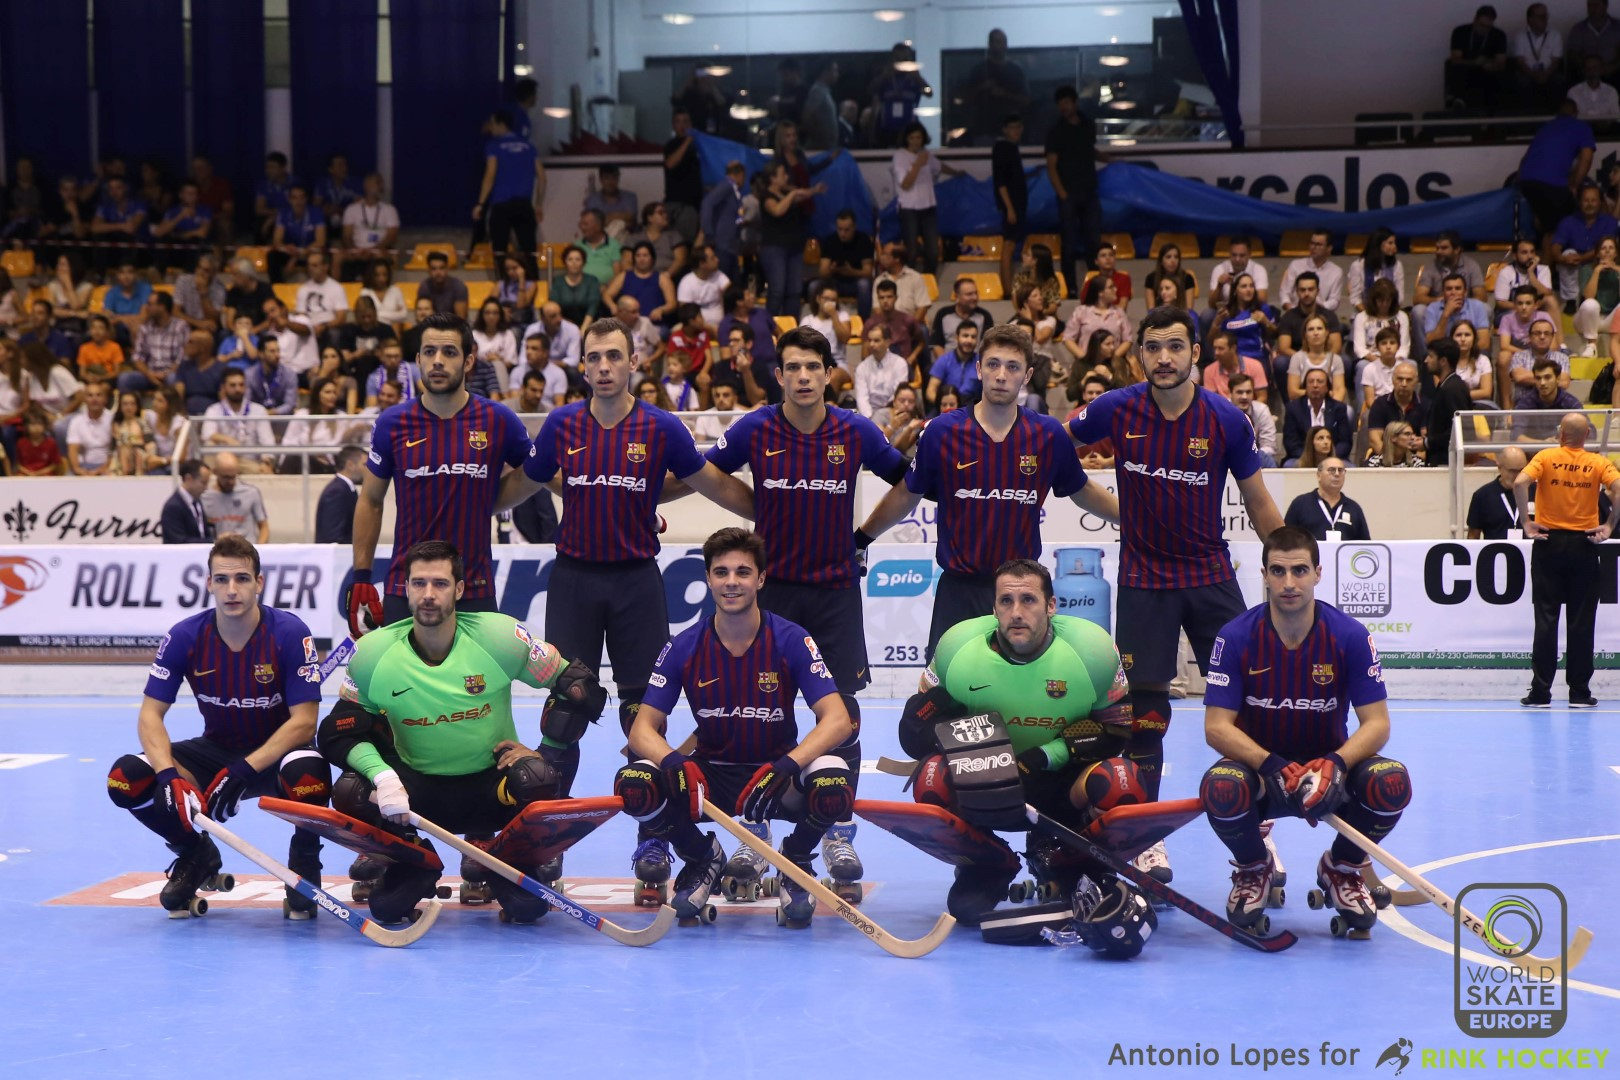 Barcelos_Barça (23)-2